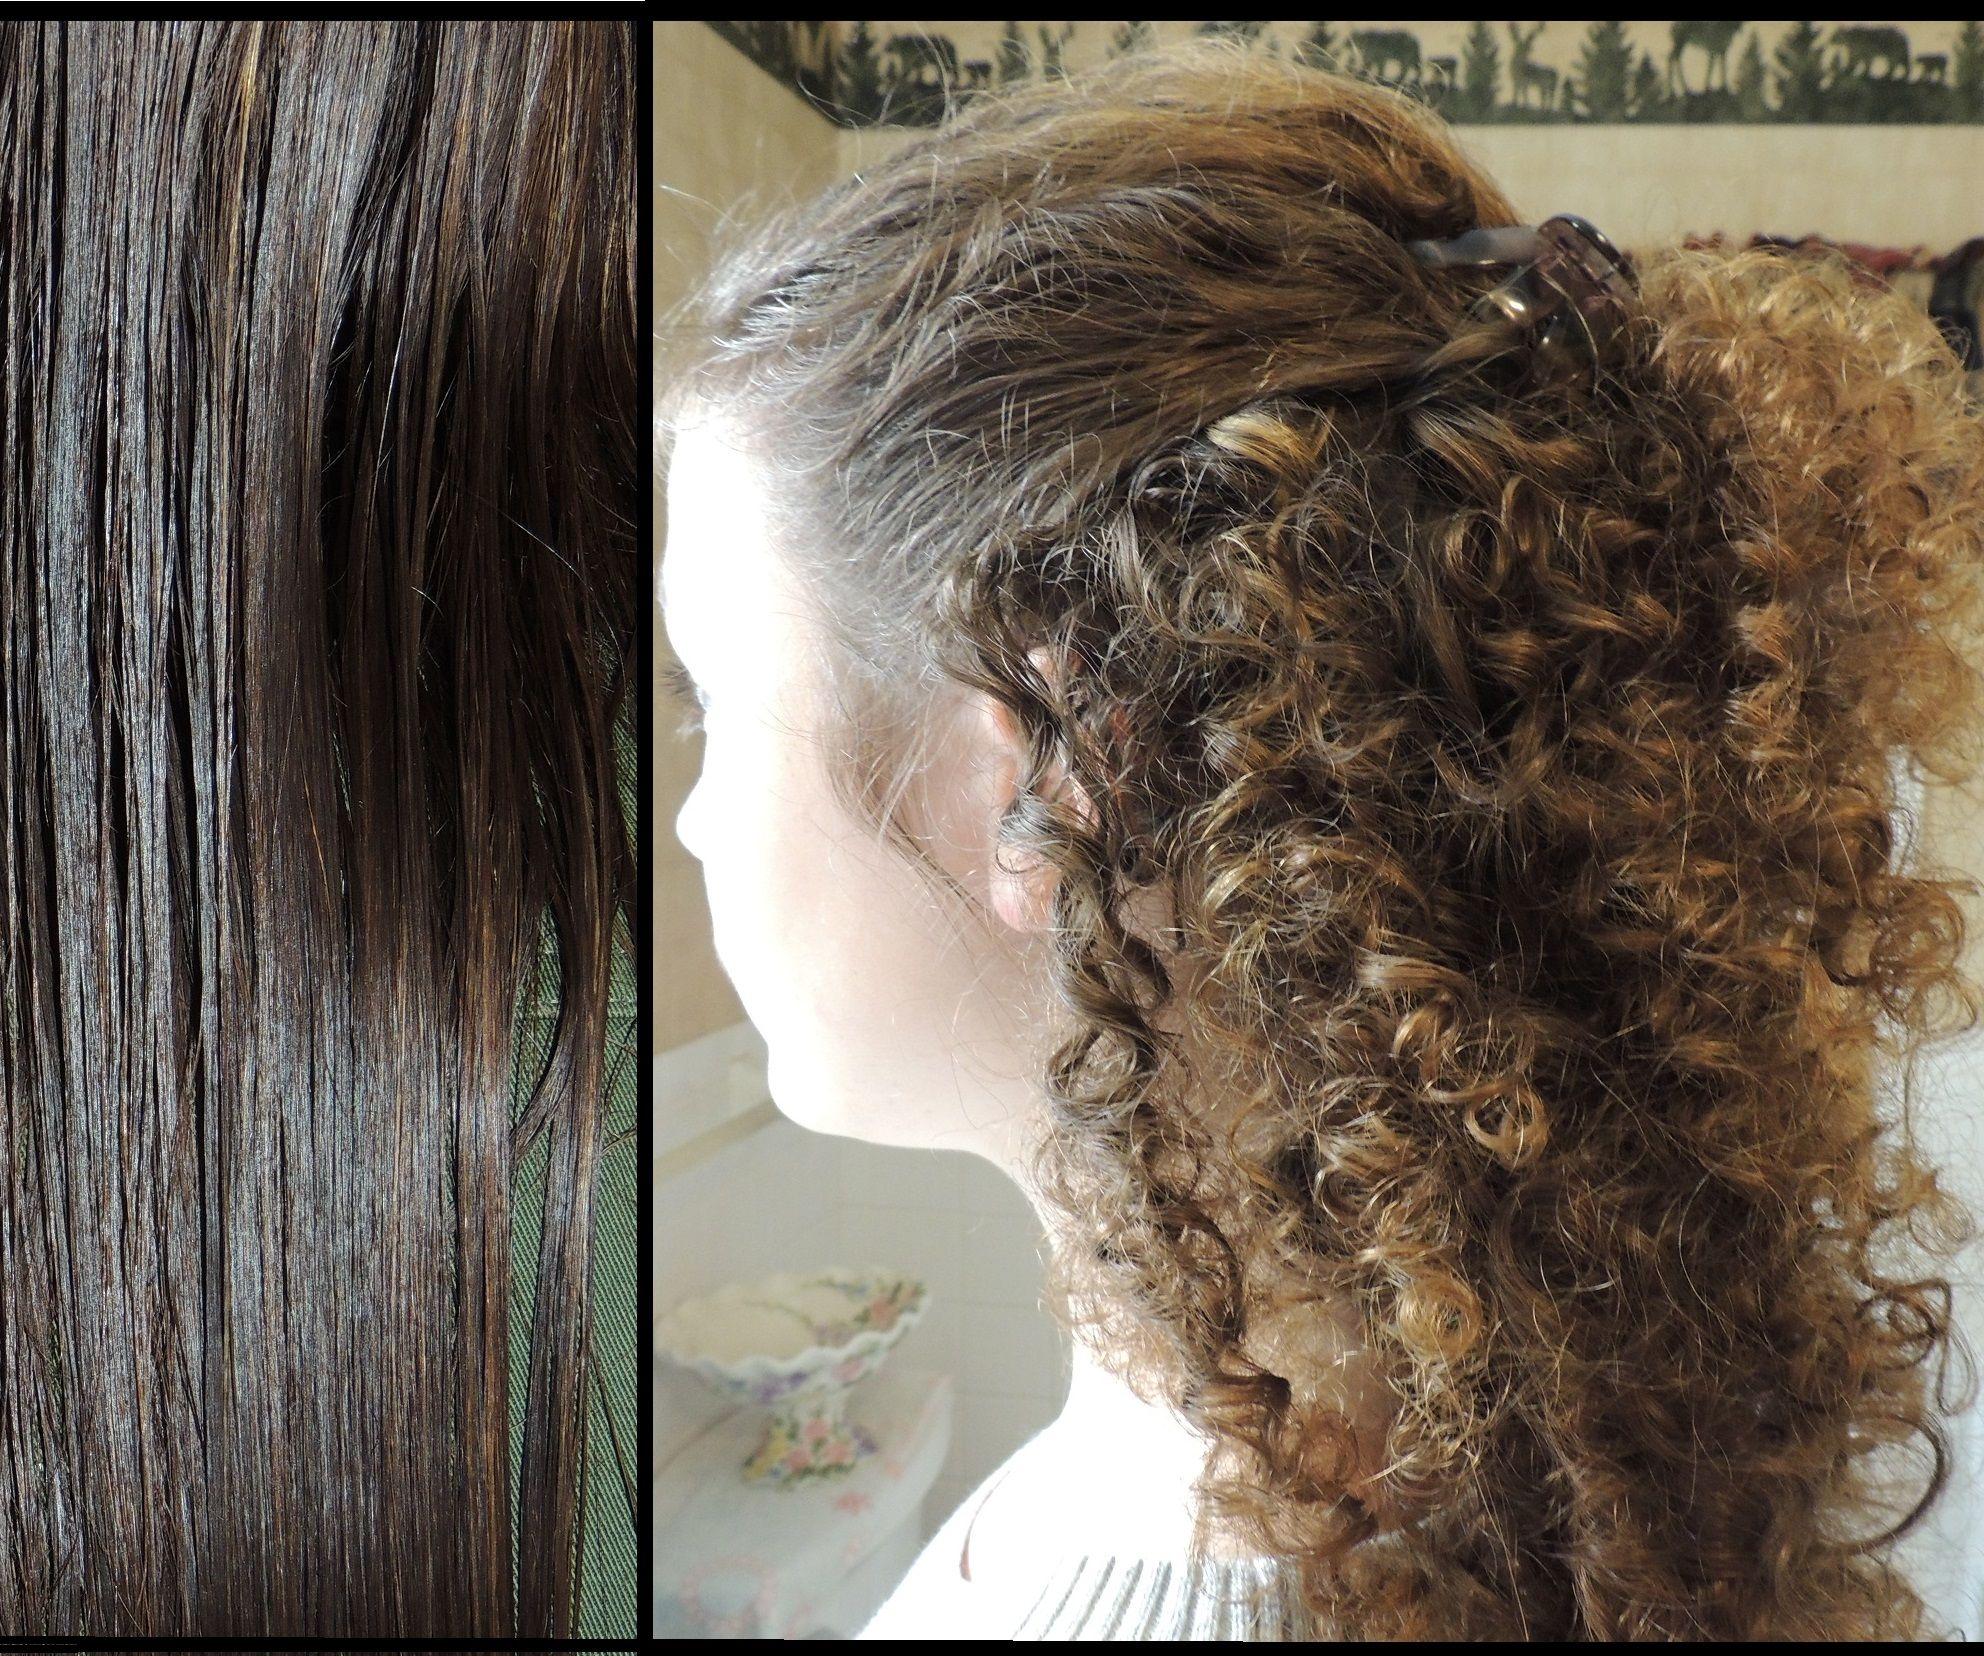 Spectacular Curls Using Straws!